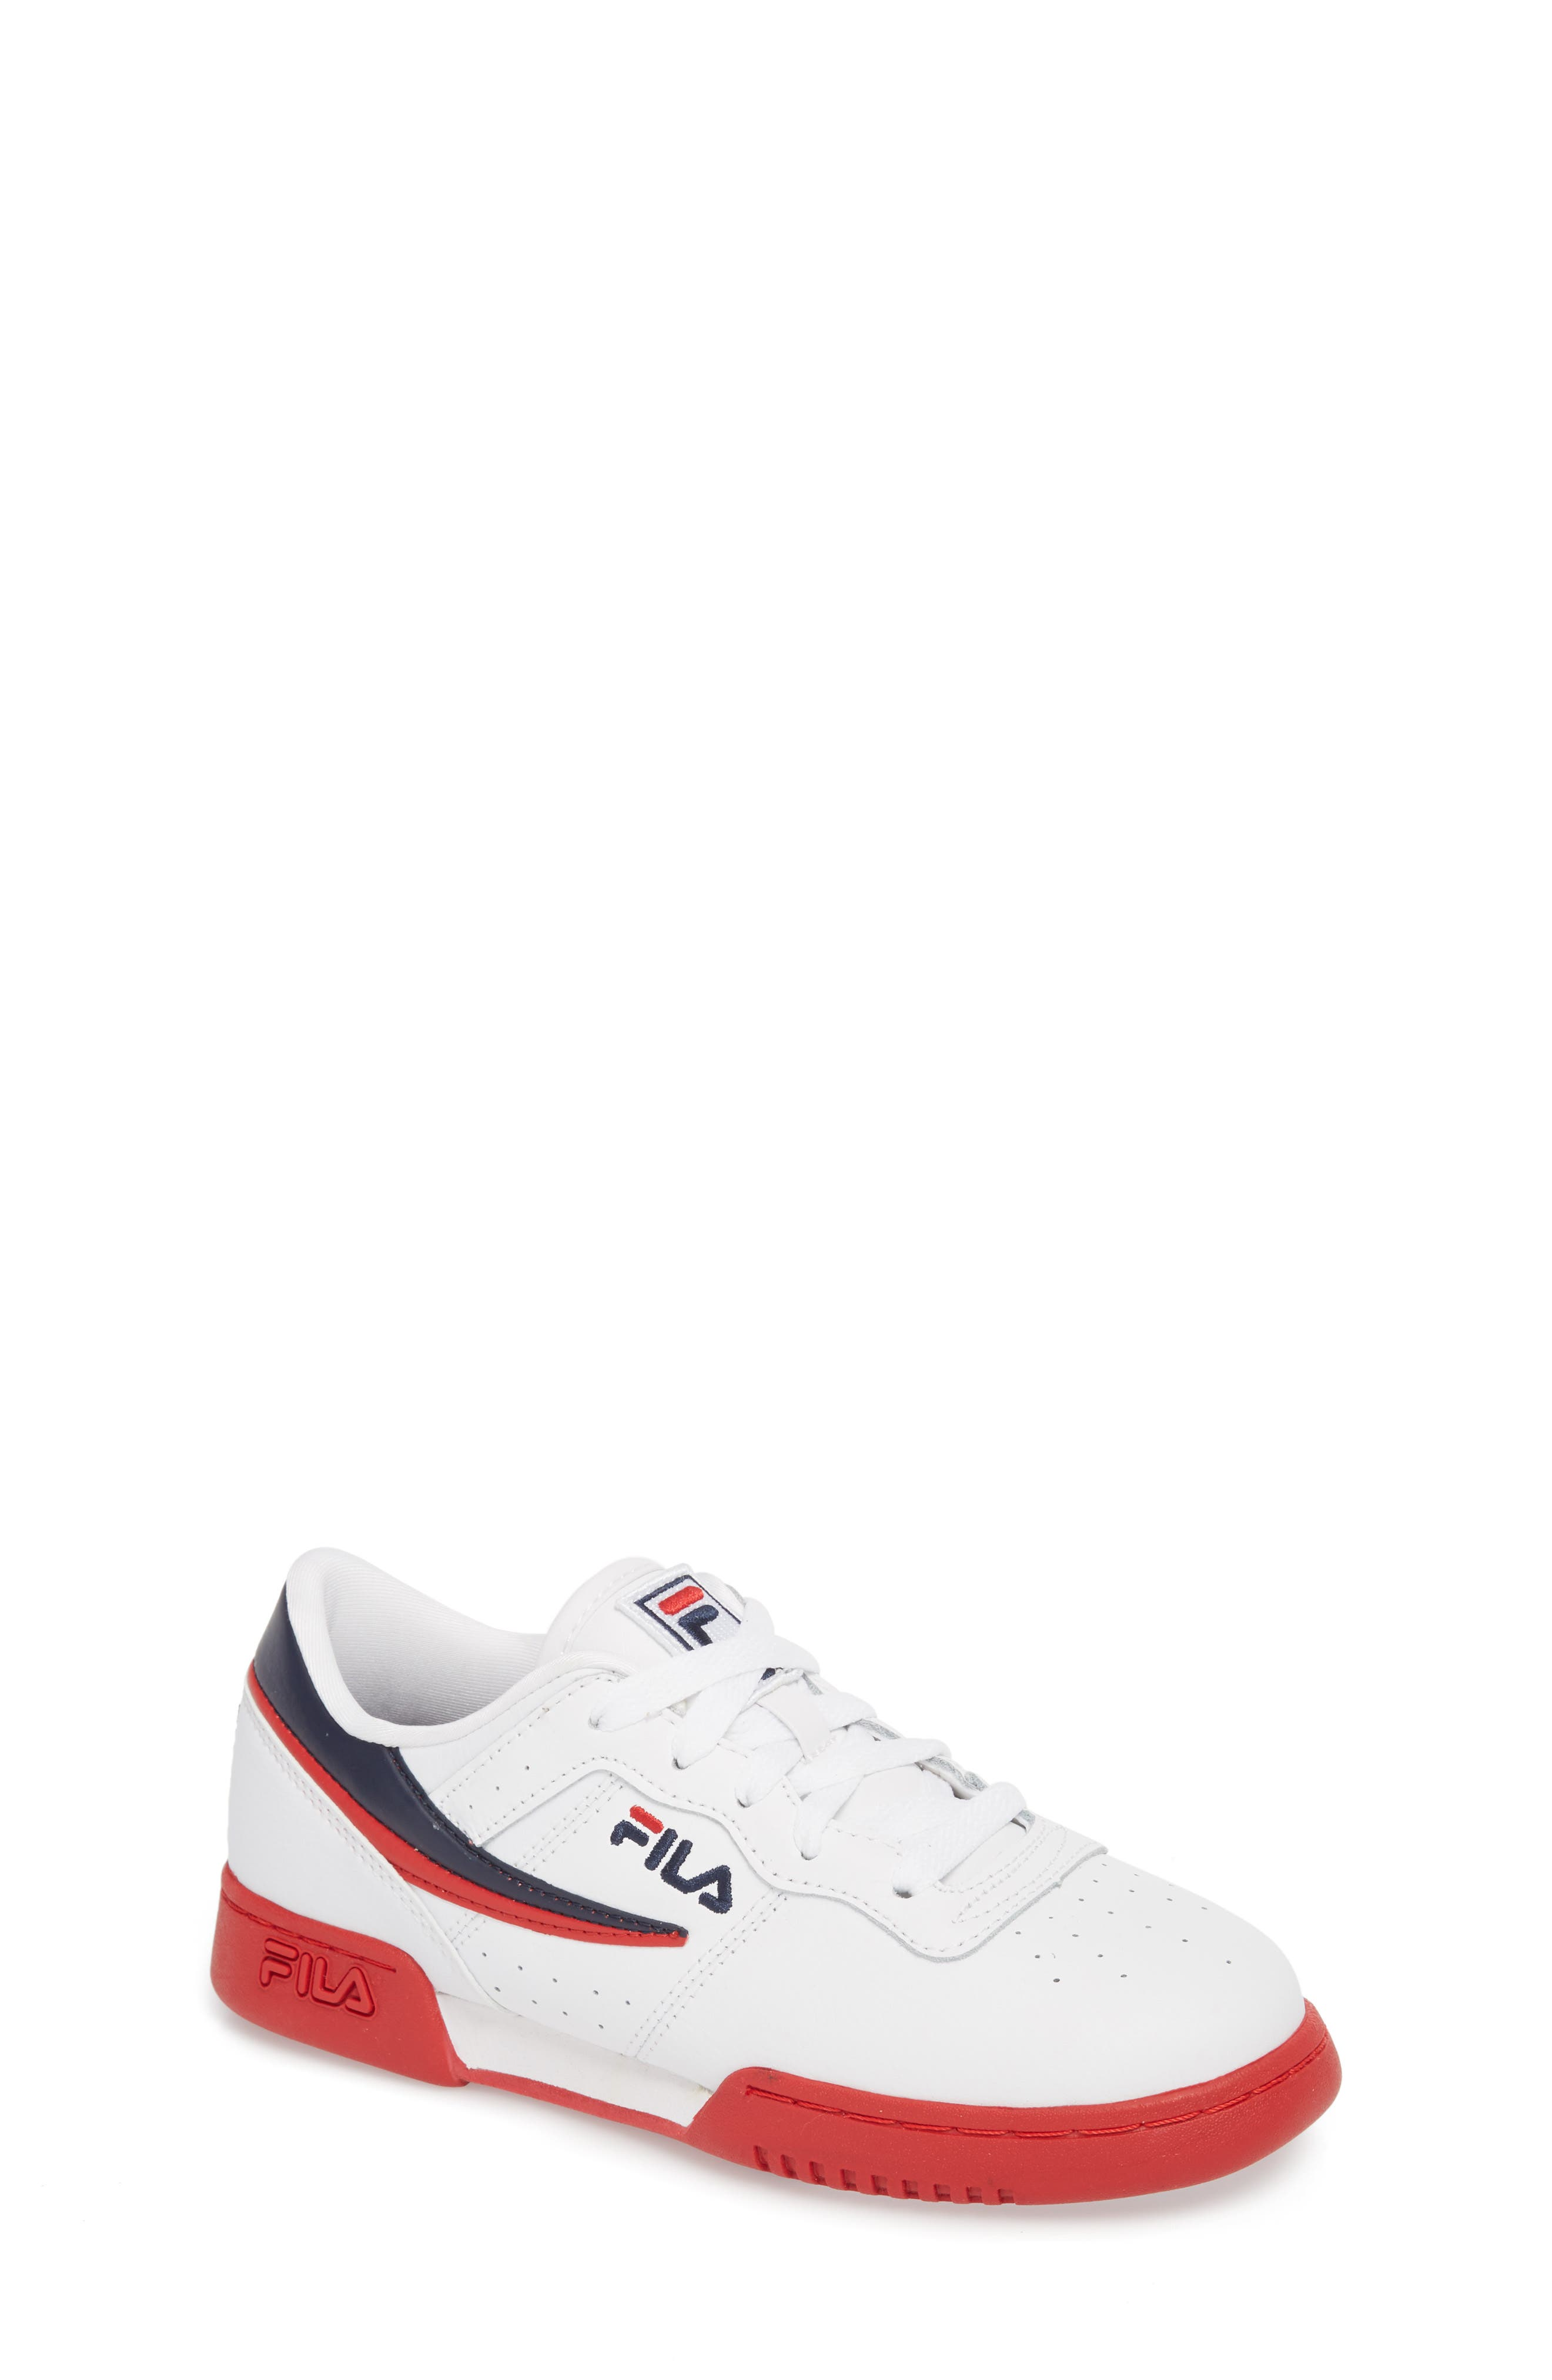 Original Fitness Sneaker,                             Main thumbnail 1, color,                             WHITE/ FILA RED